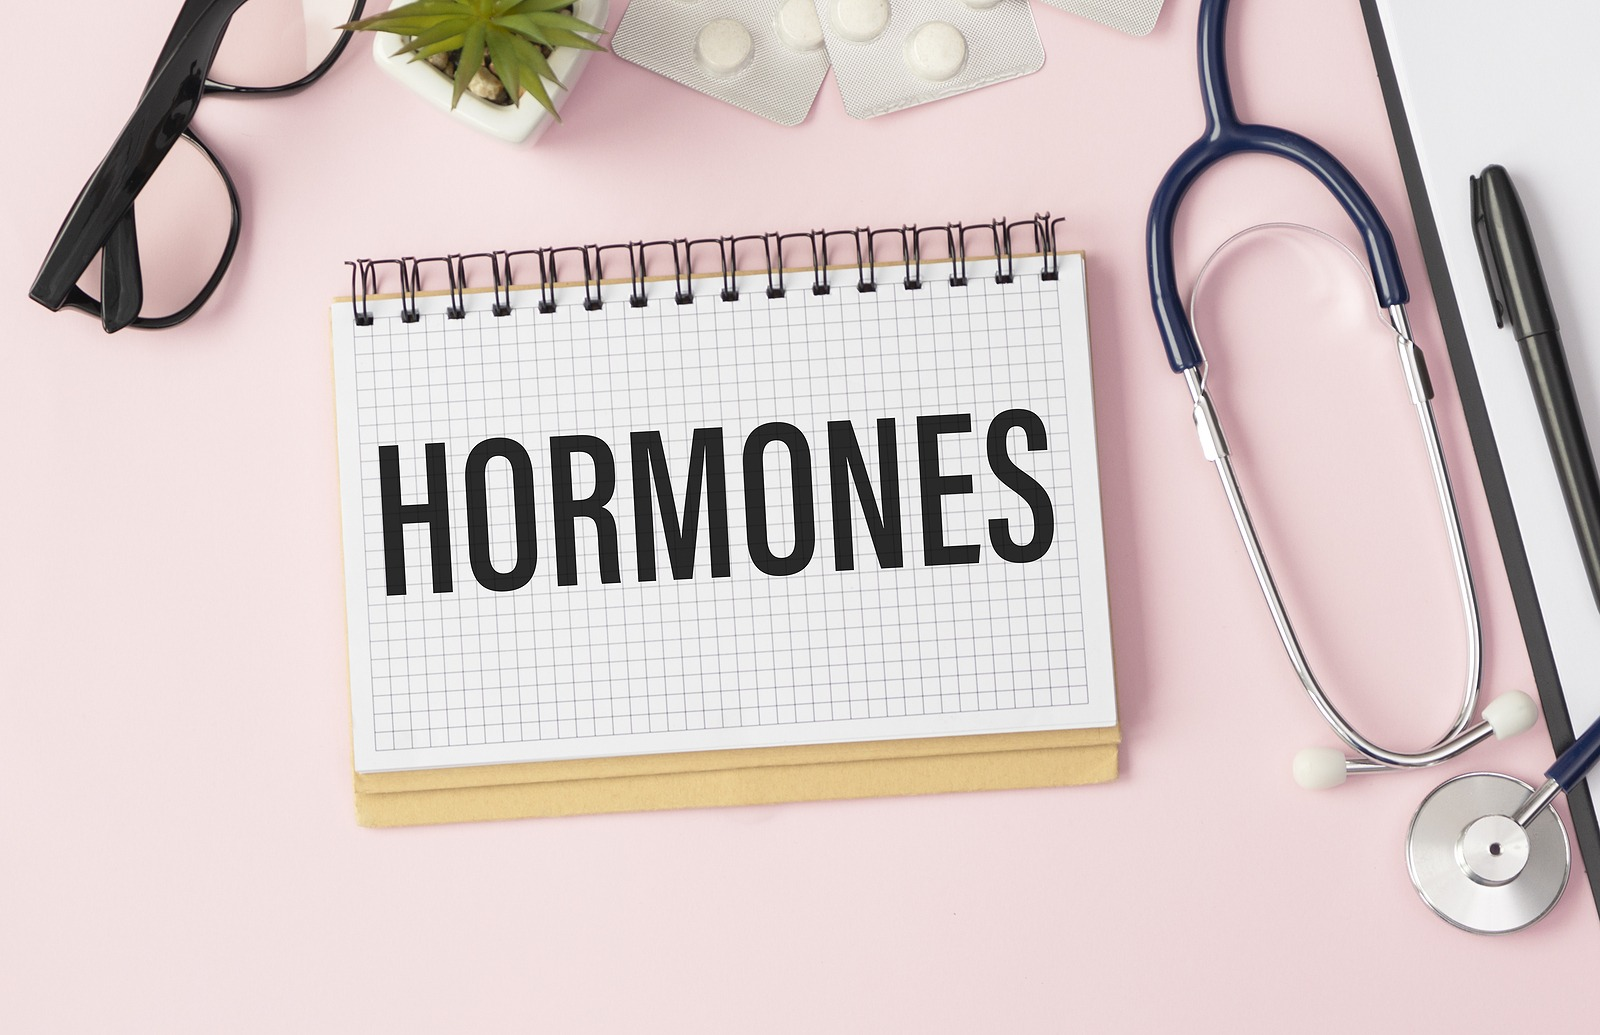 Hormone gegen Haarausfall